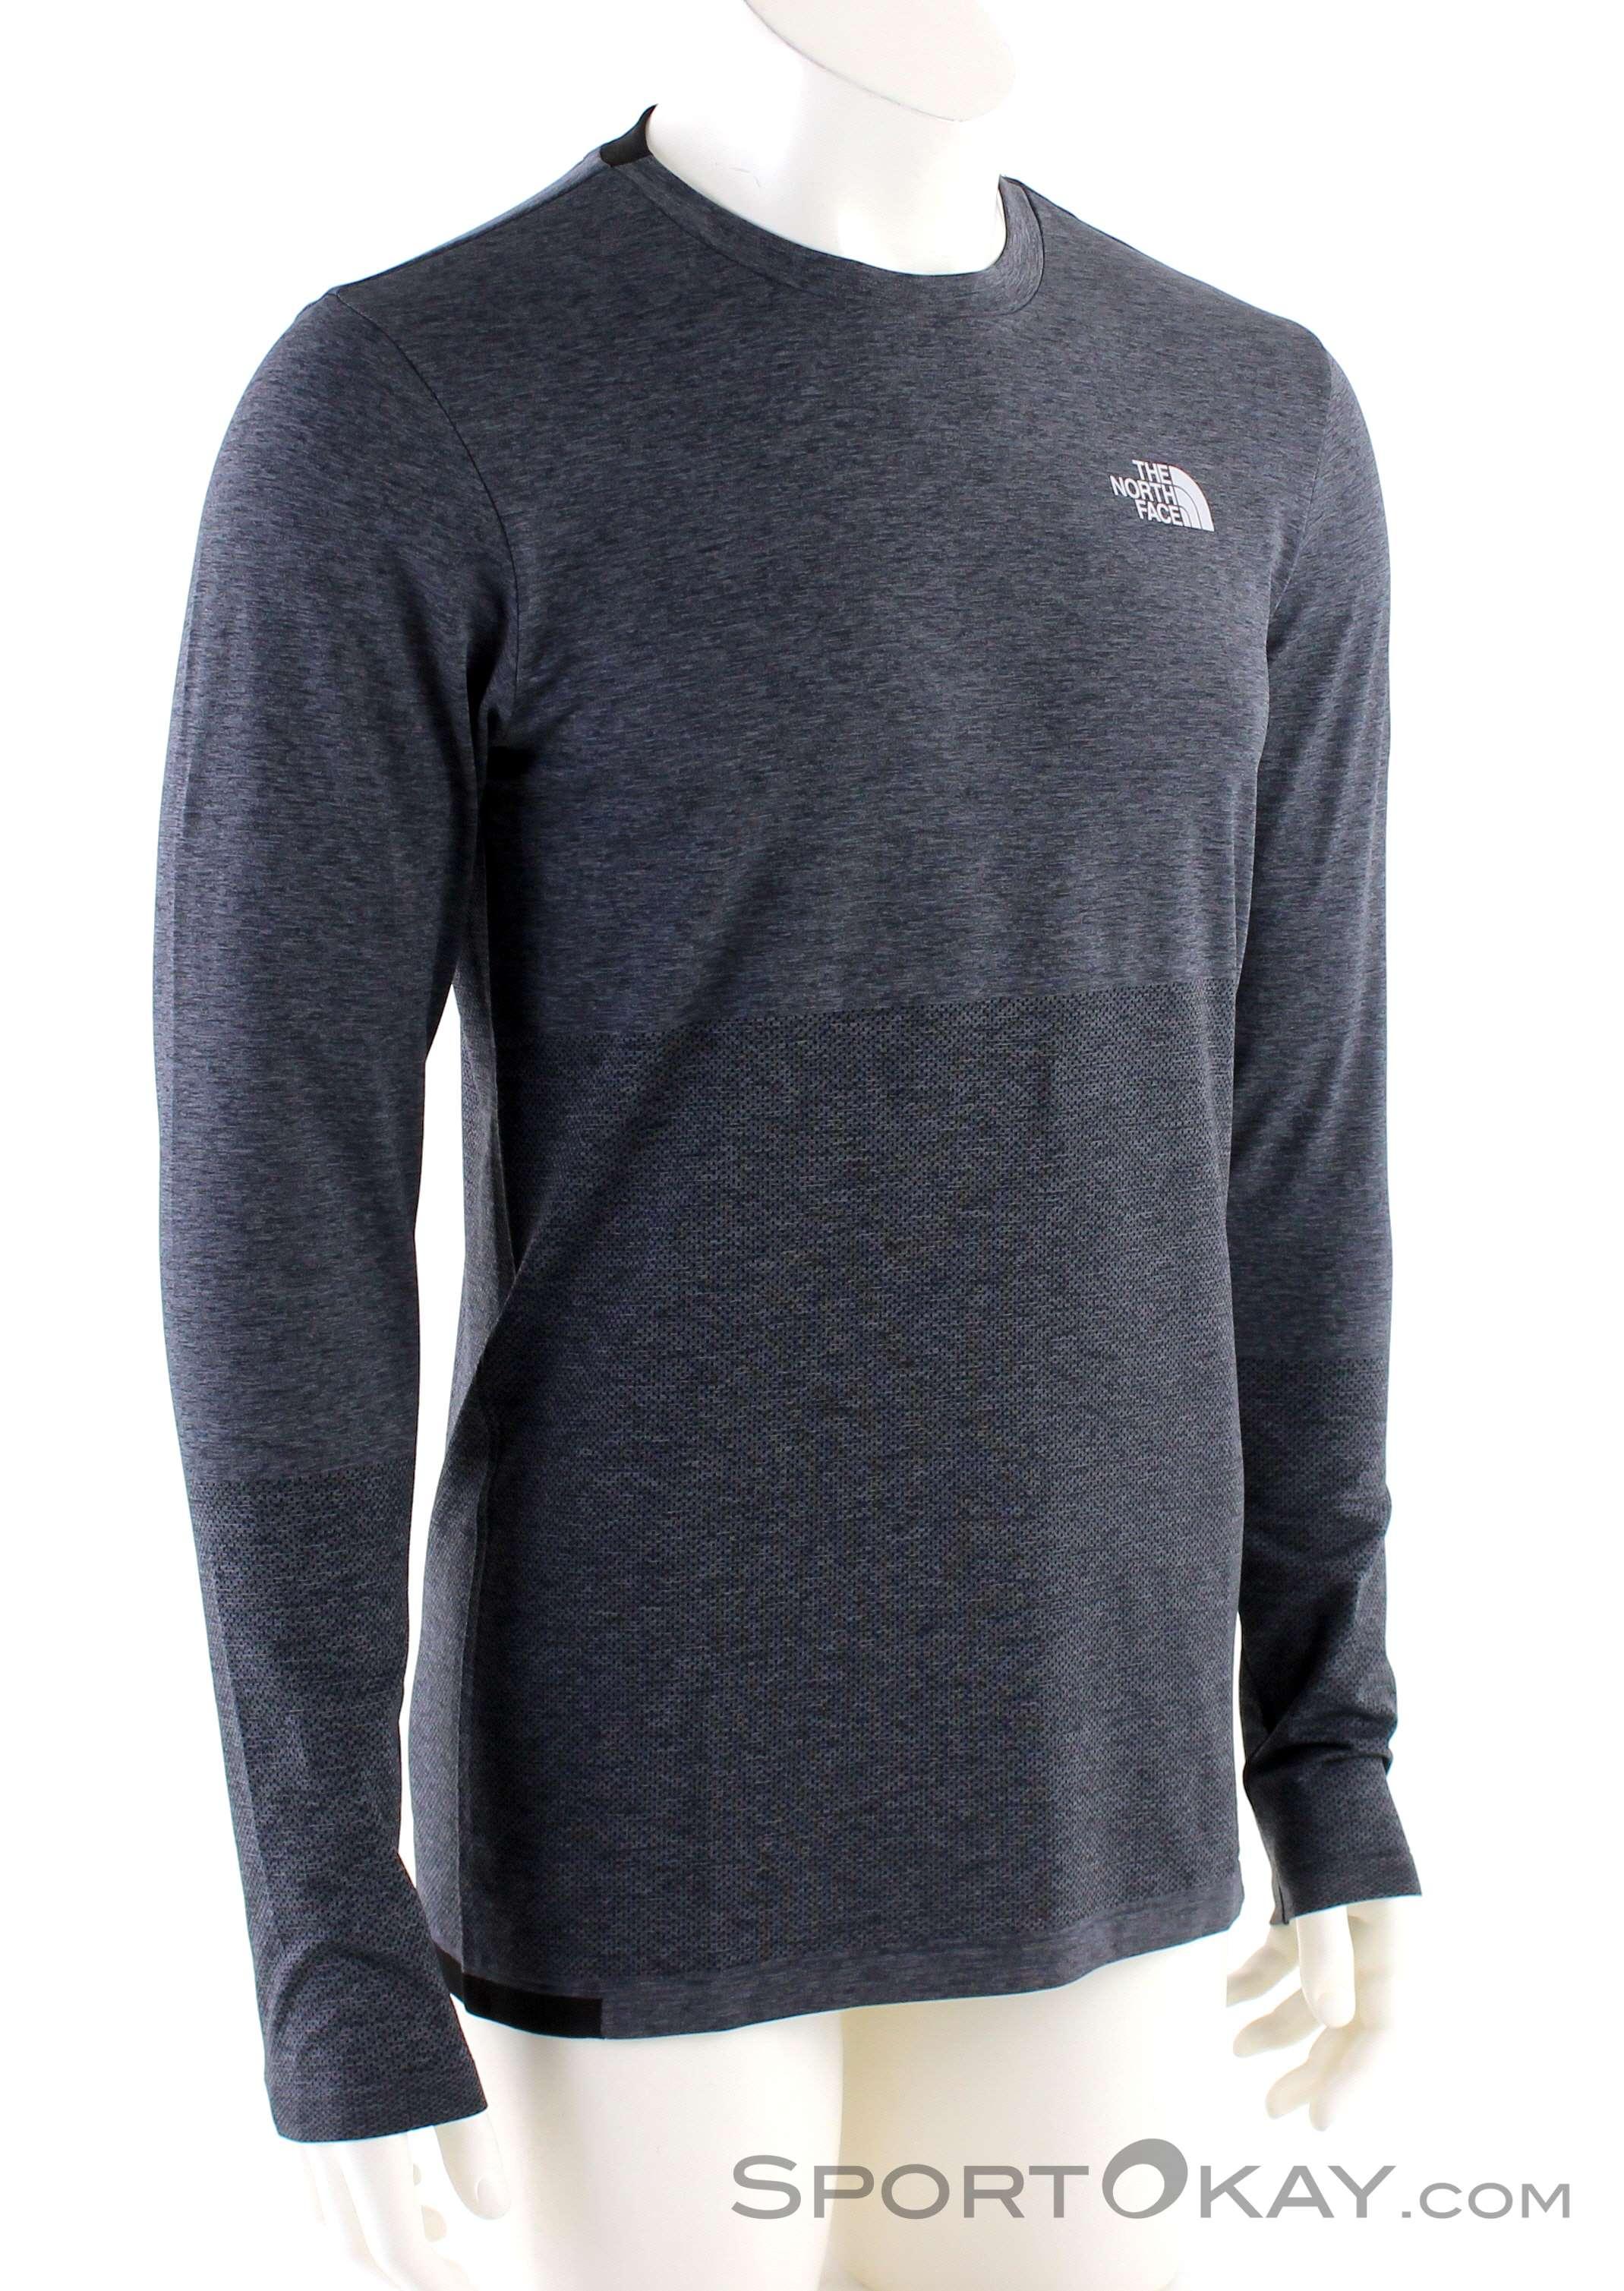 The North Face L1 LS Herren Funktionsshirt-Grau-XL